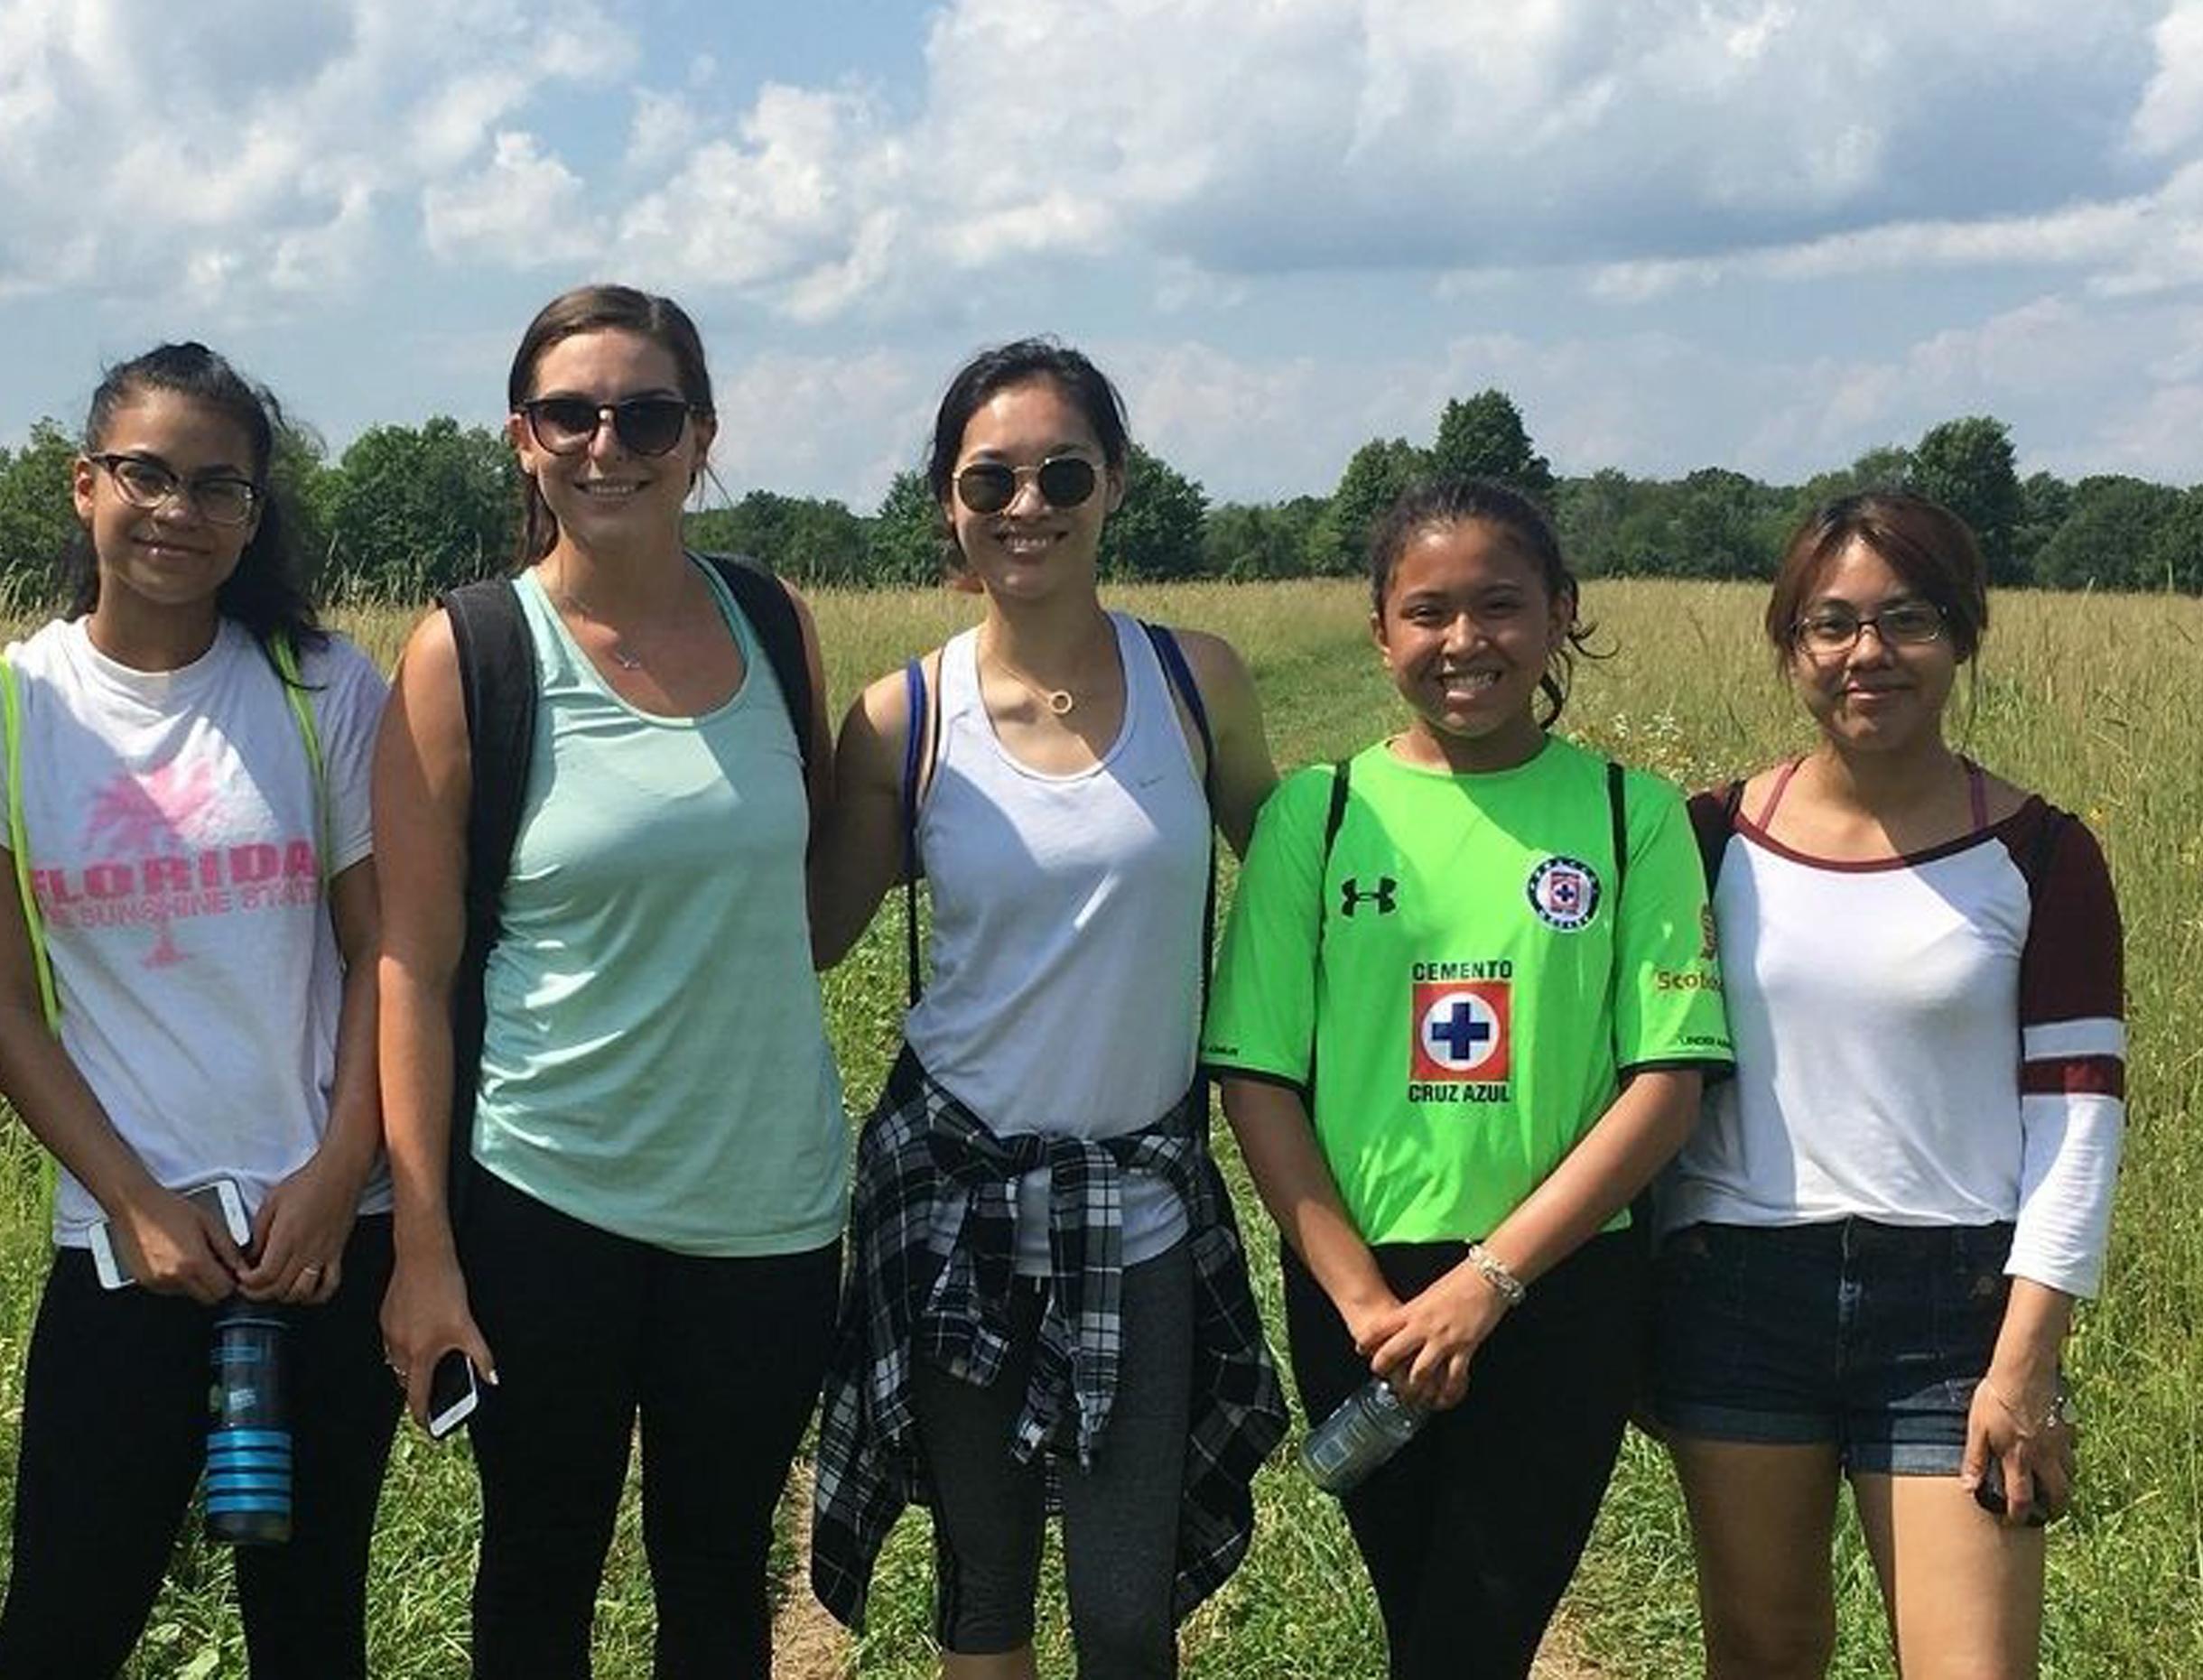 Huntington Park 2 (IG, Brie, Brenda, MN, JC) 2017-0814 EDIT.jpg